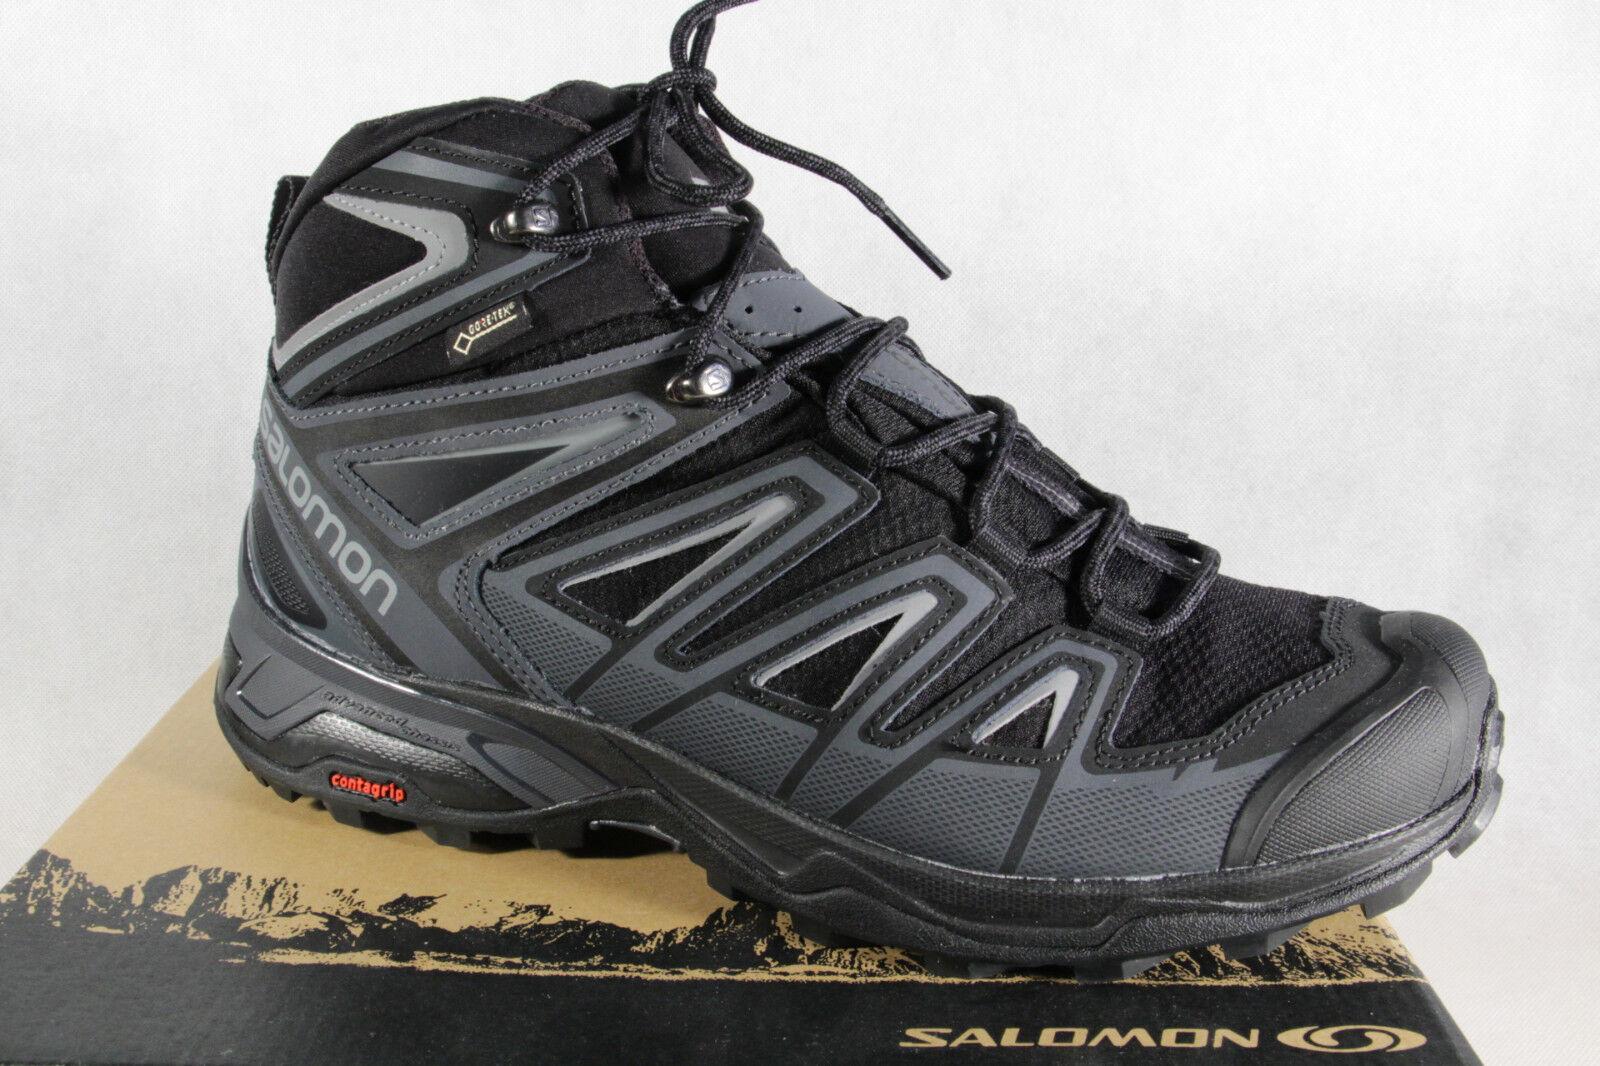 Salomon Stiefel Stiefel GTX X Ultra 3 MID GTX Stiefel schwarz/ grau wasserdicht Gore-Tex NEU d17db1